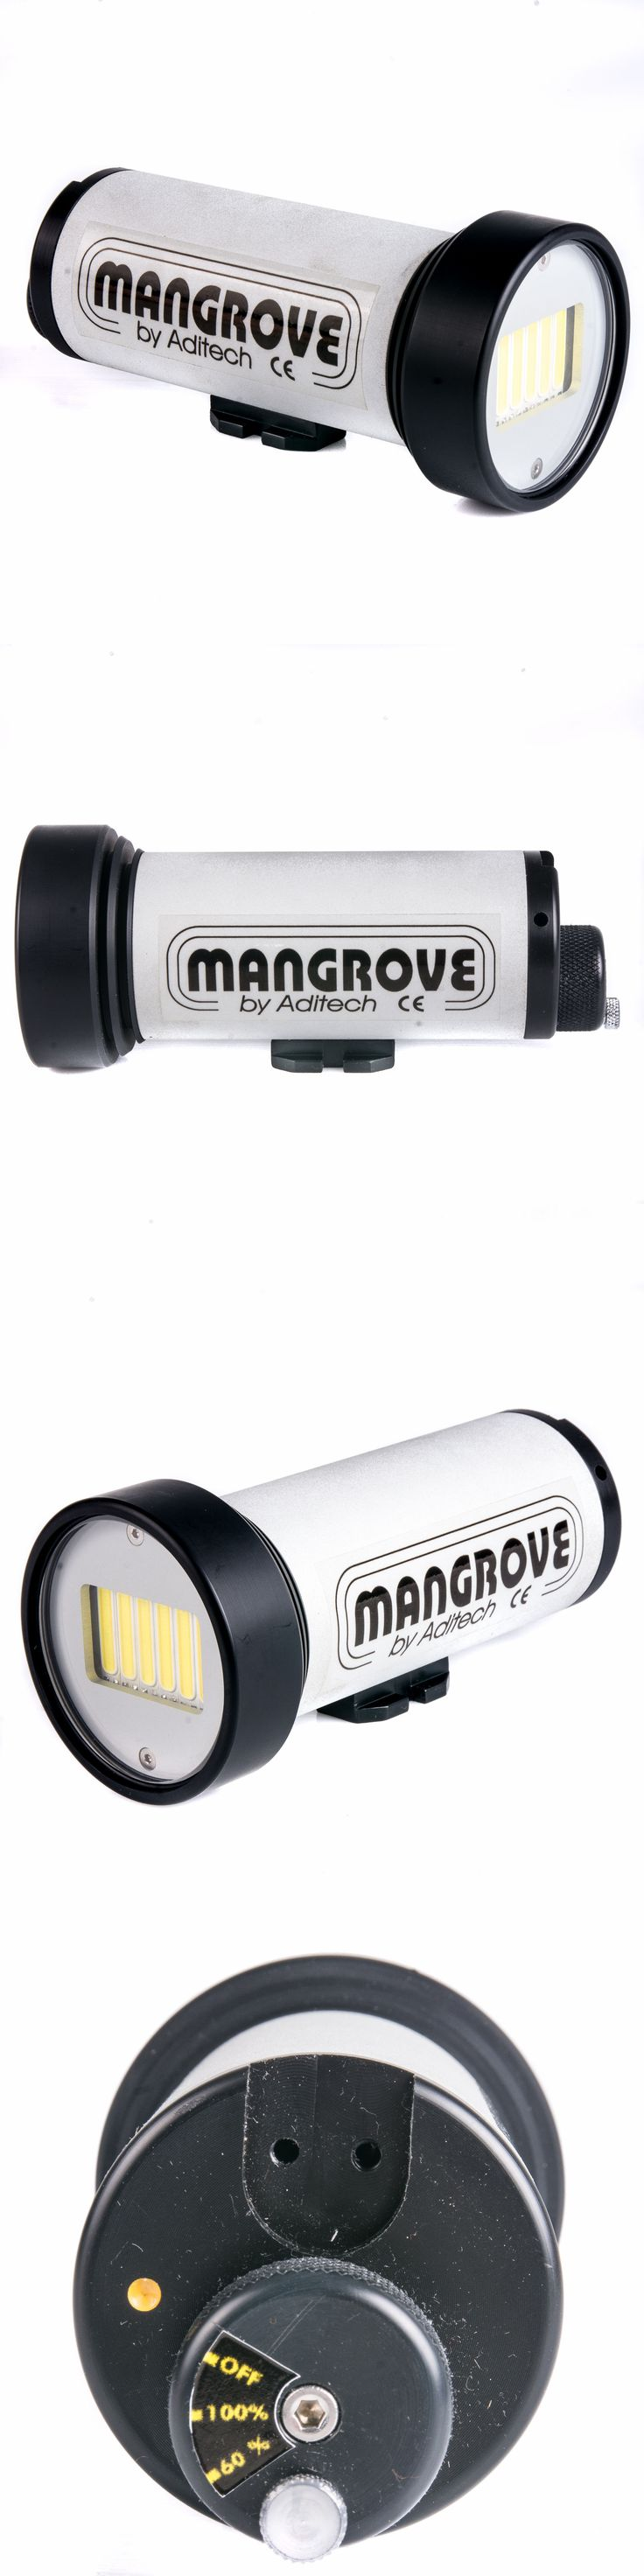 Lights 29575: Aditech Mangrove Videocompact Vc-2L6 Underwater Video Light -> BUY IT NOW ONLY: $199.95 on eBay!